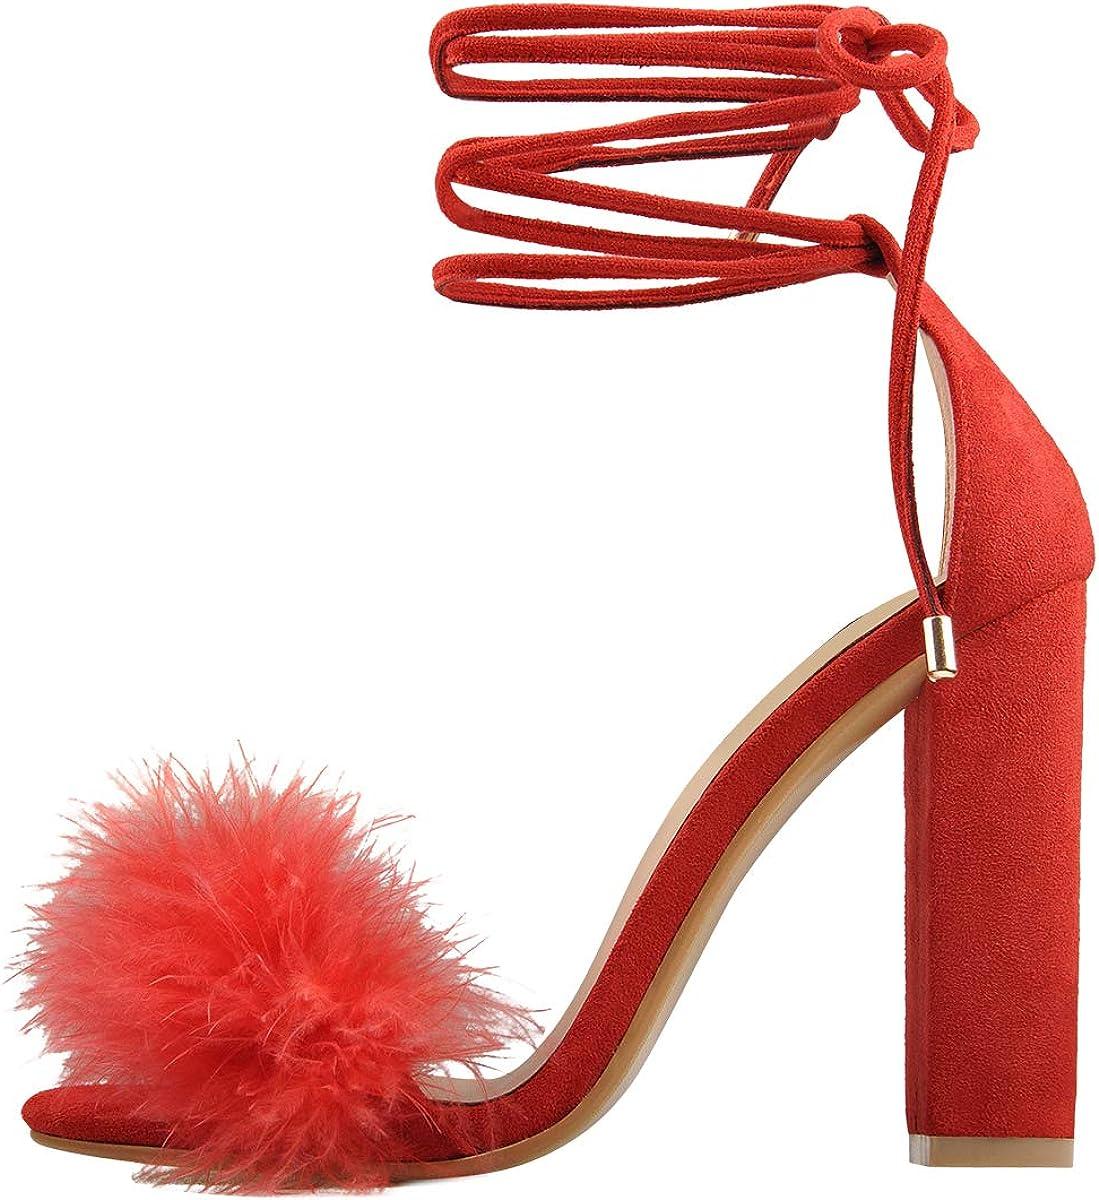 Richealnana Women's Fluffy Marabou Feather Heeled Sandals